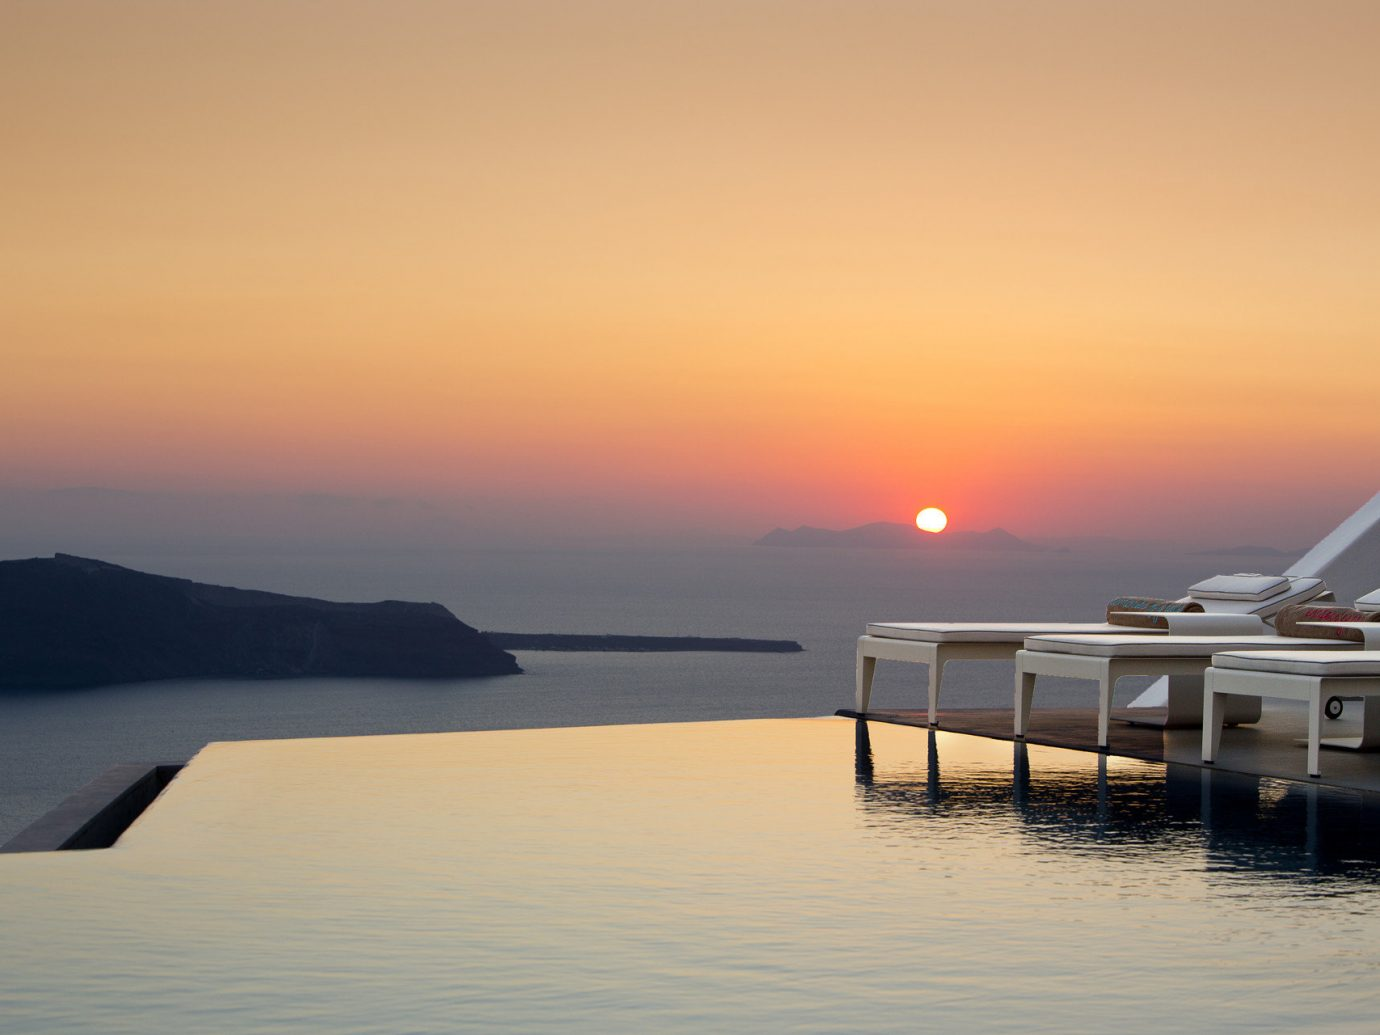 Hotels Trip Ideas water sky outdoor Boat scene Sea horizon sunrise Sunset dawn morning dusk afterglow Ocean vehicle reflection evening bay Coast Lake dock